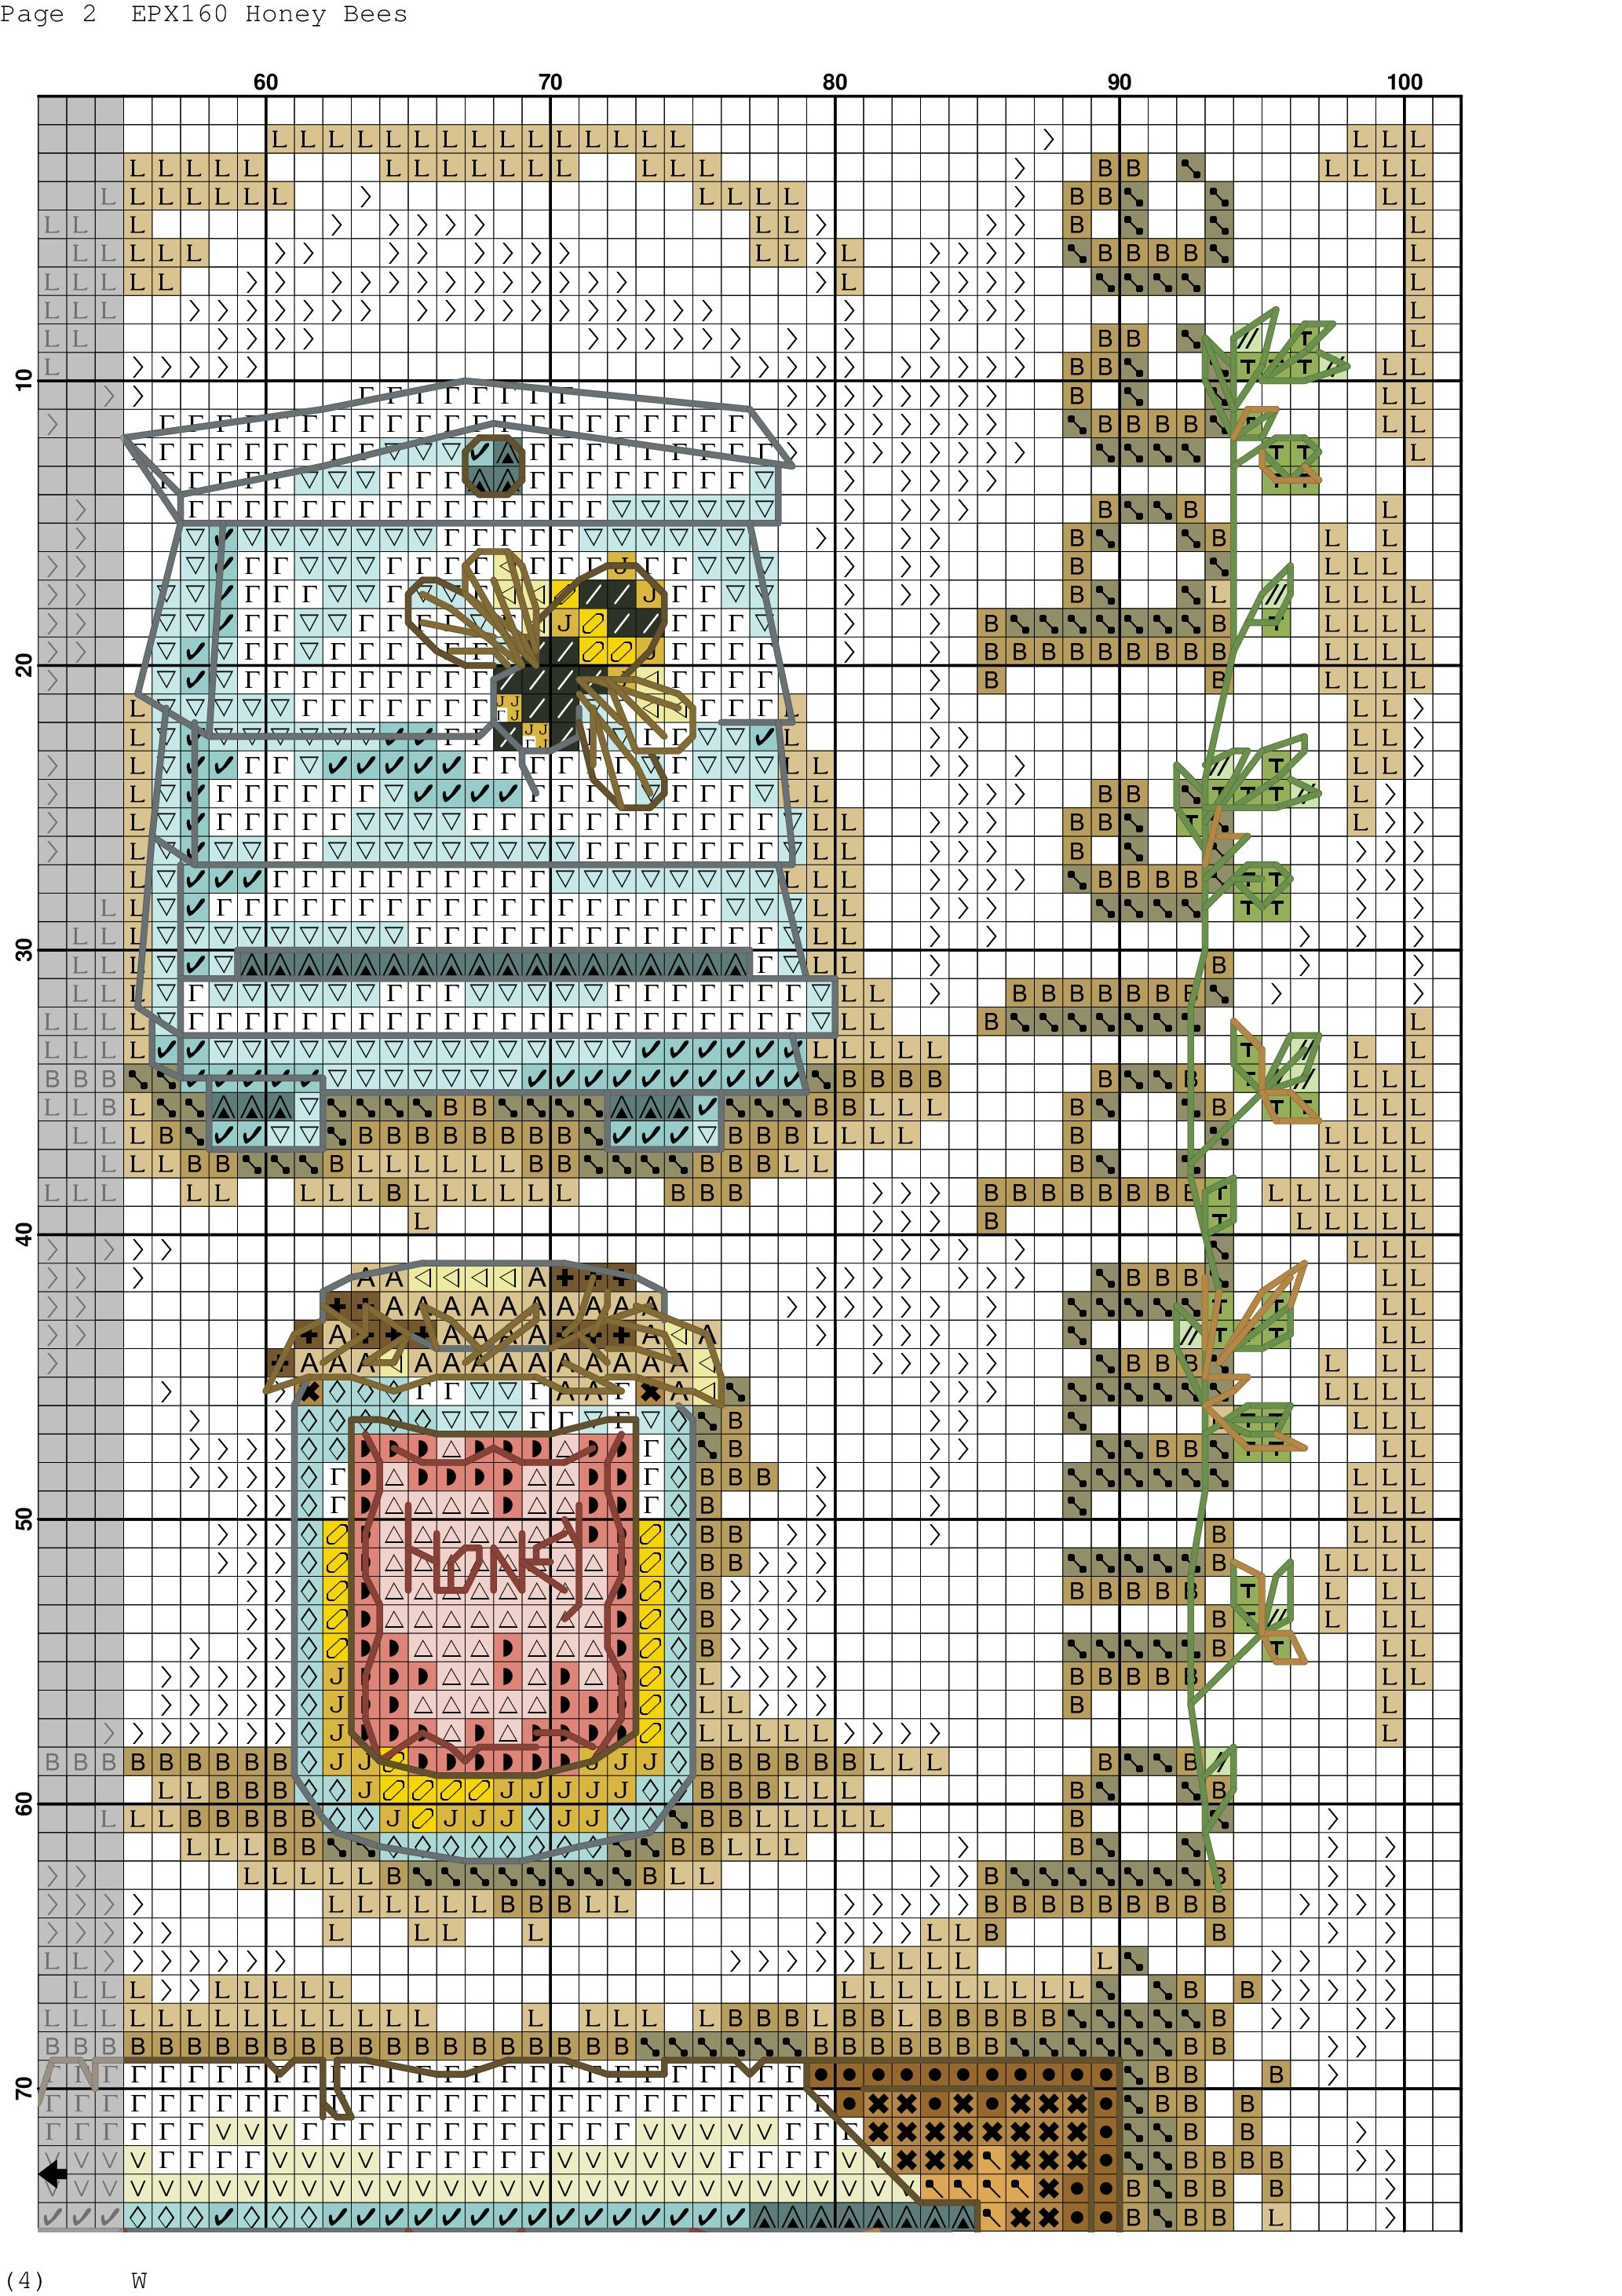 3/6 Honey bees. Cross stitch.